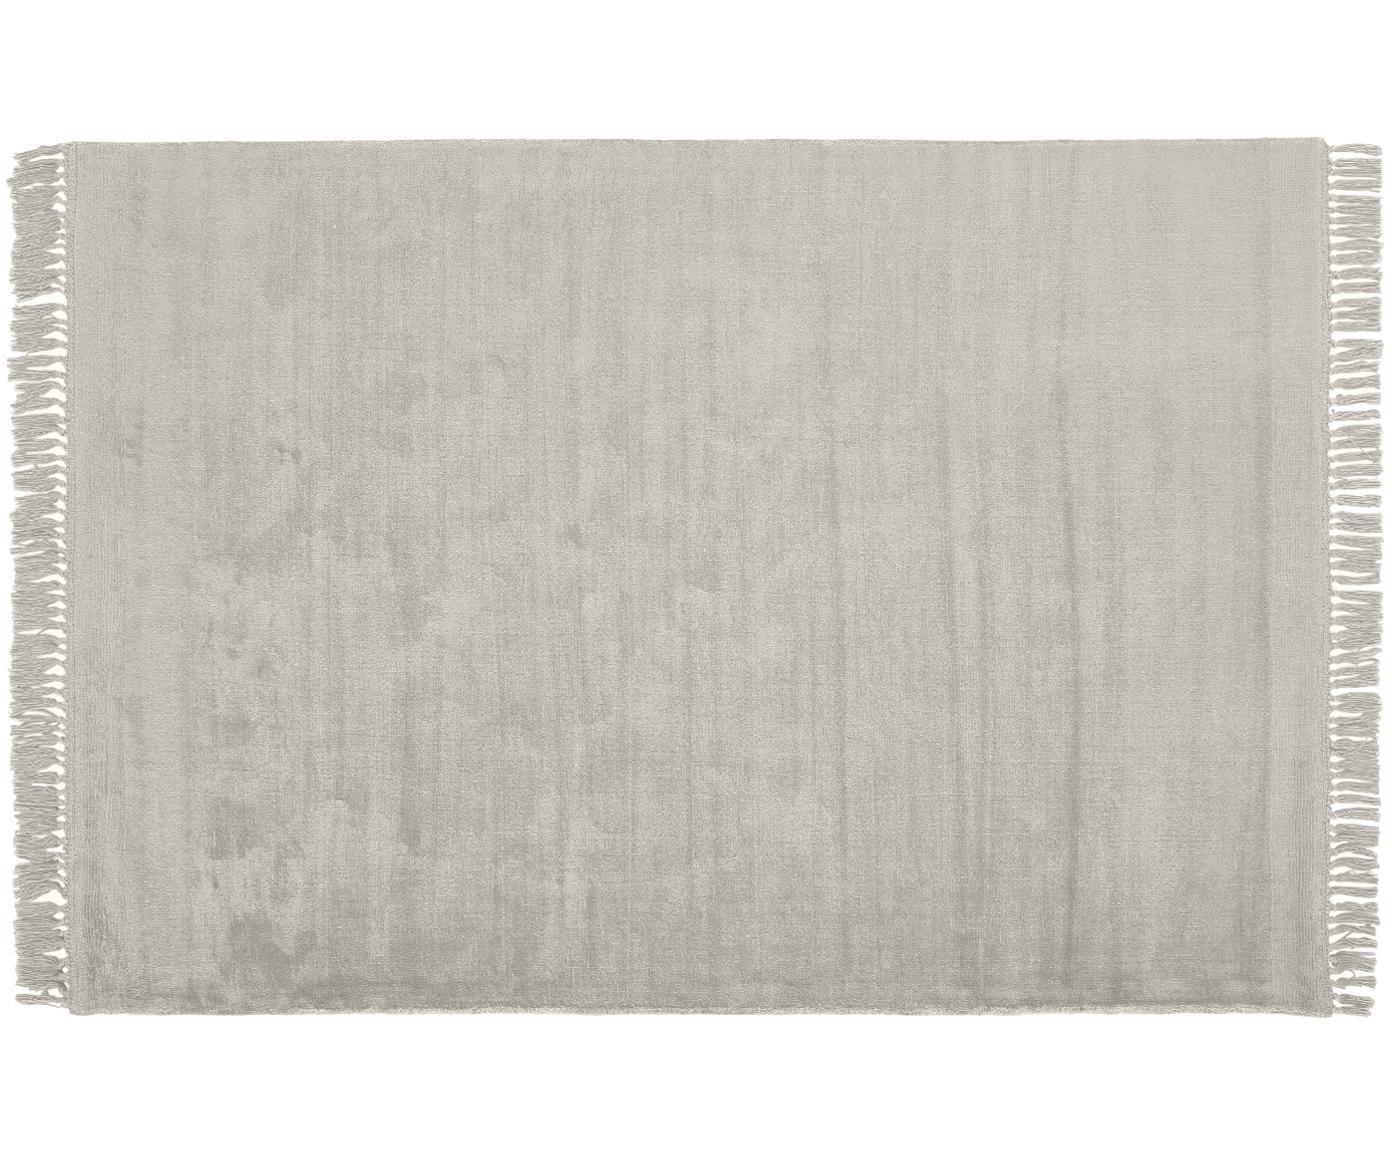 Alfombra artesanal de viscosa con flecos Aria, Parte superior: 100%viscosa, Reverso: 100%algodón, Gris claro, An 160 x L 230 cm (Tamaño M)